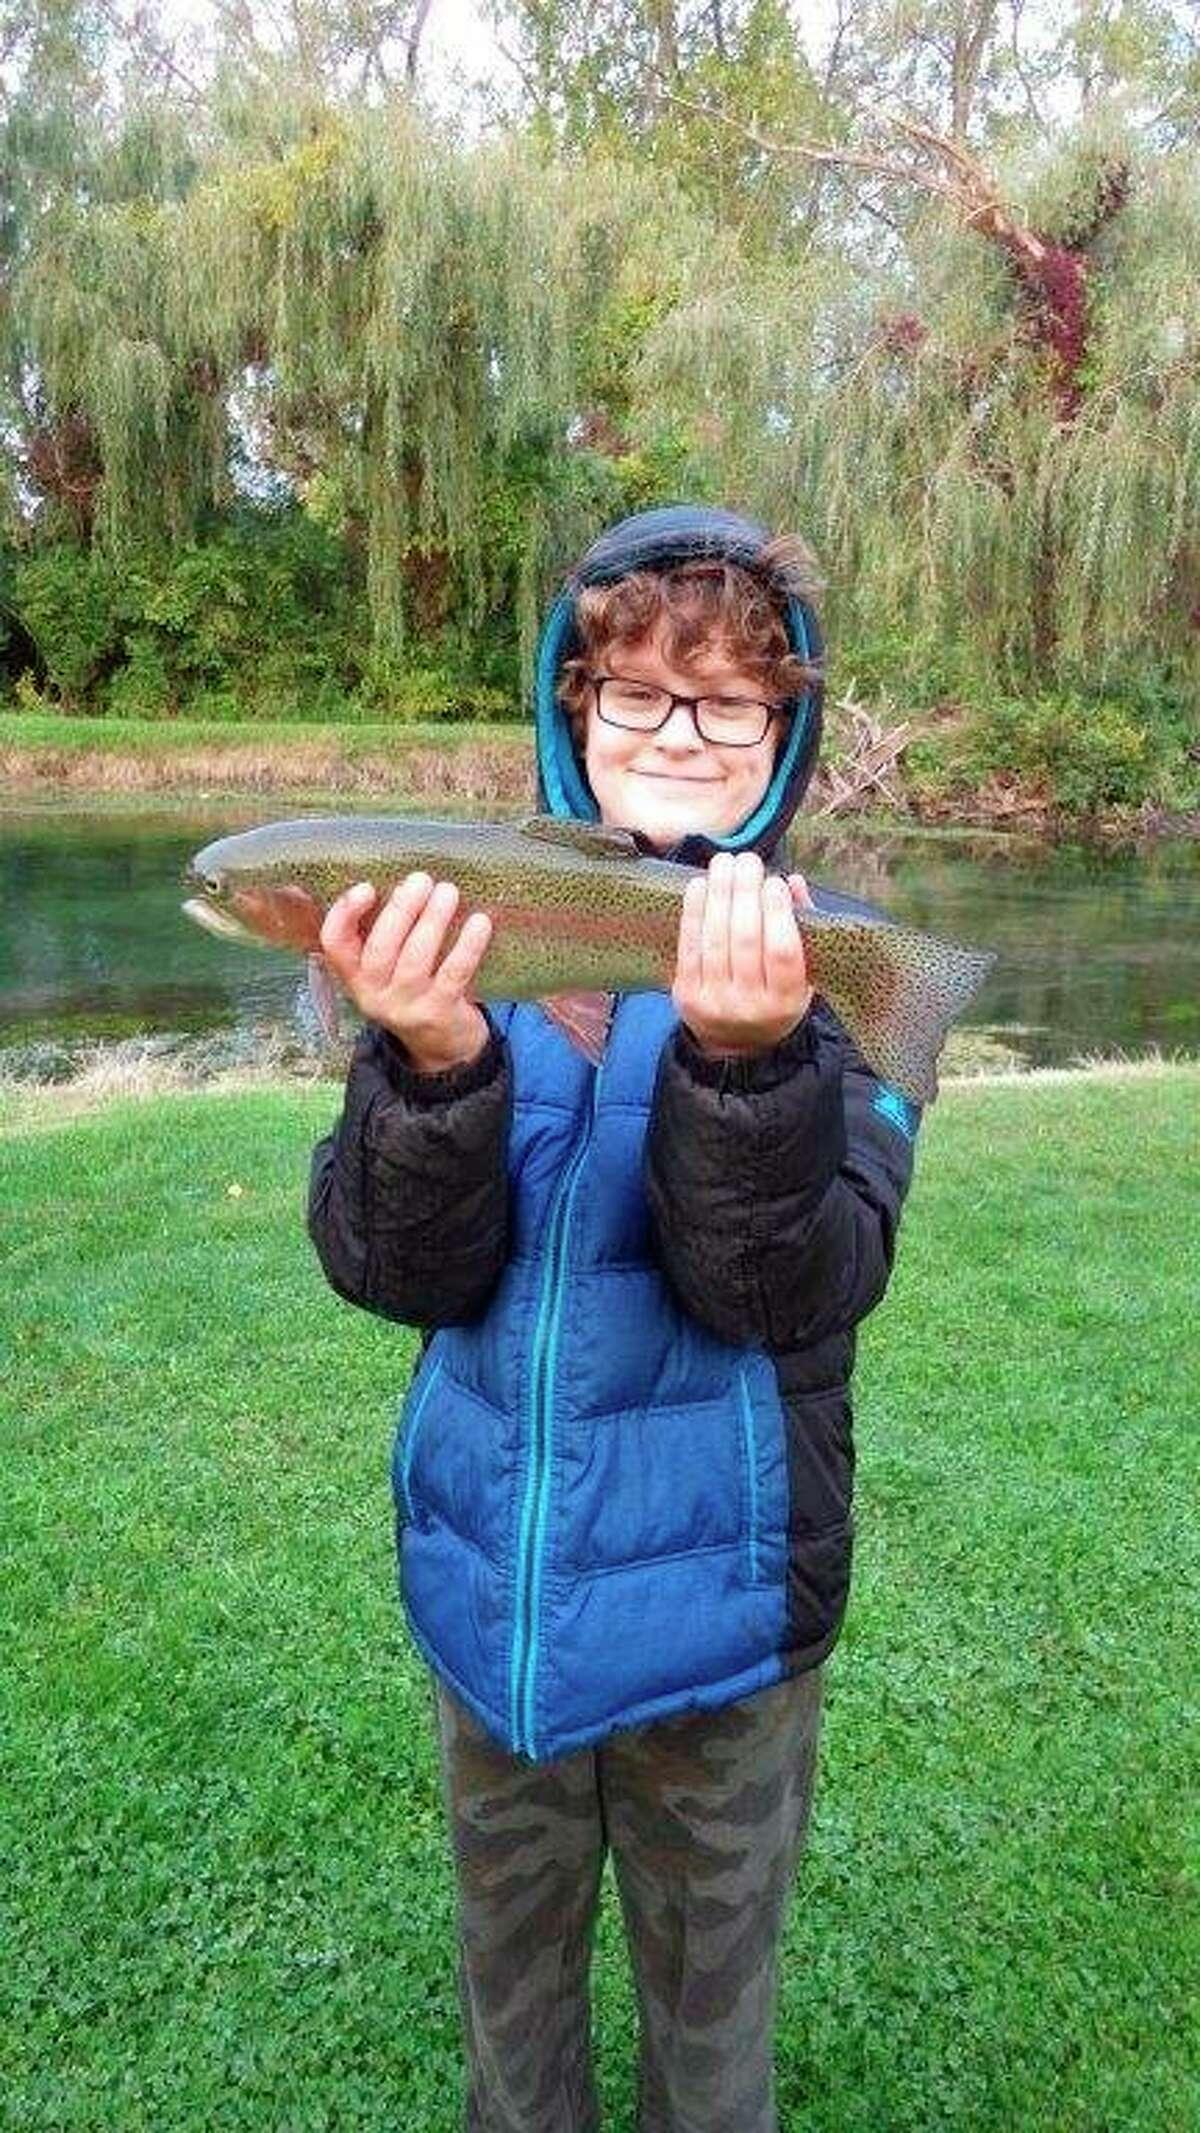 Eleven-year-old Reese Lounsbury displays a dandy rainbow trout. (Tom Lounsbury/Hearst Michigan)